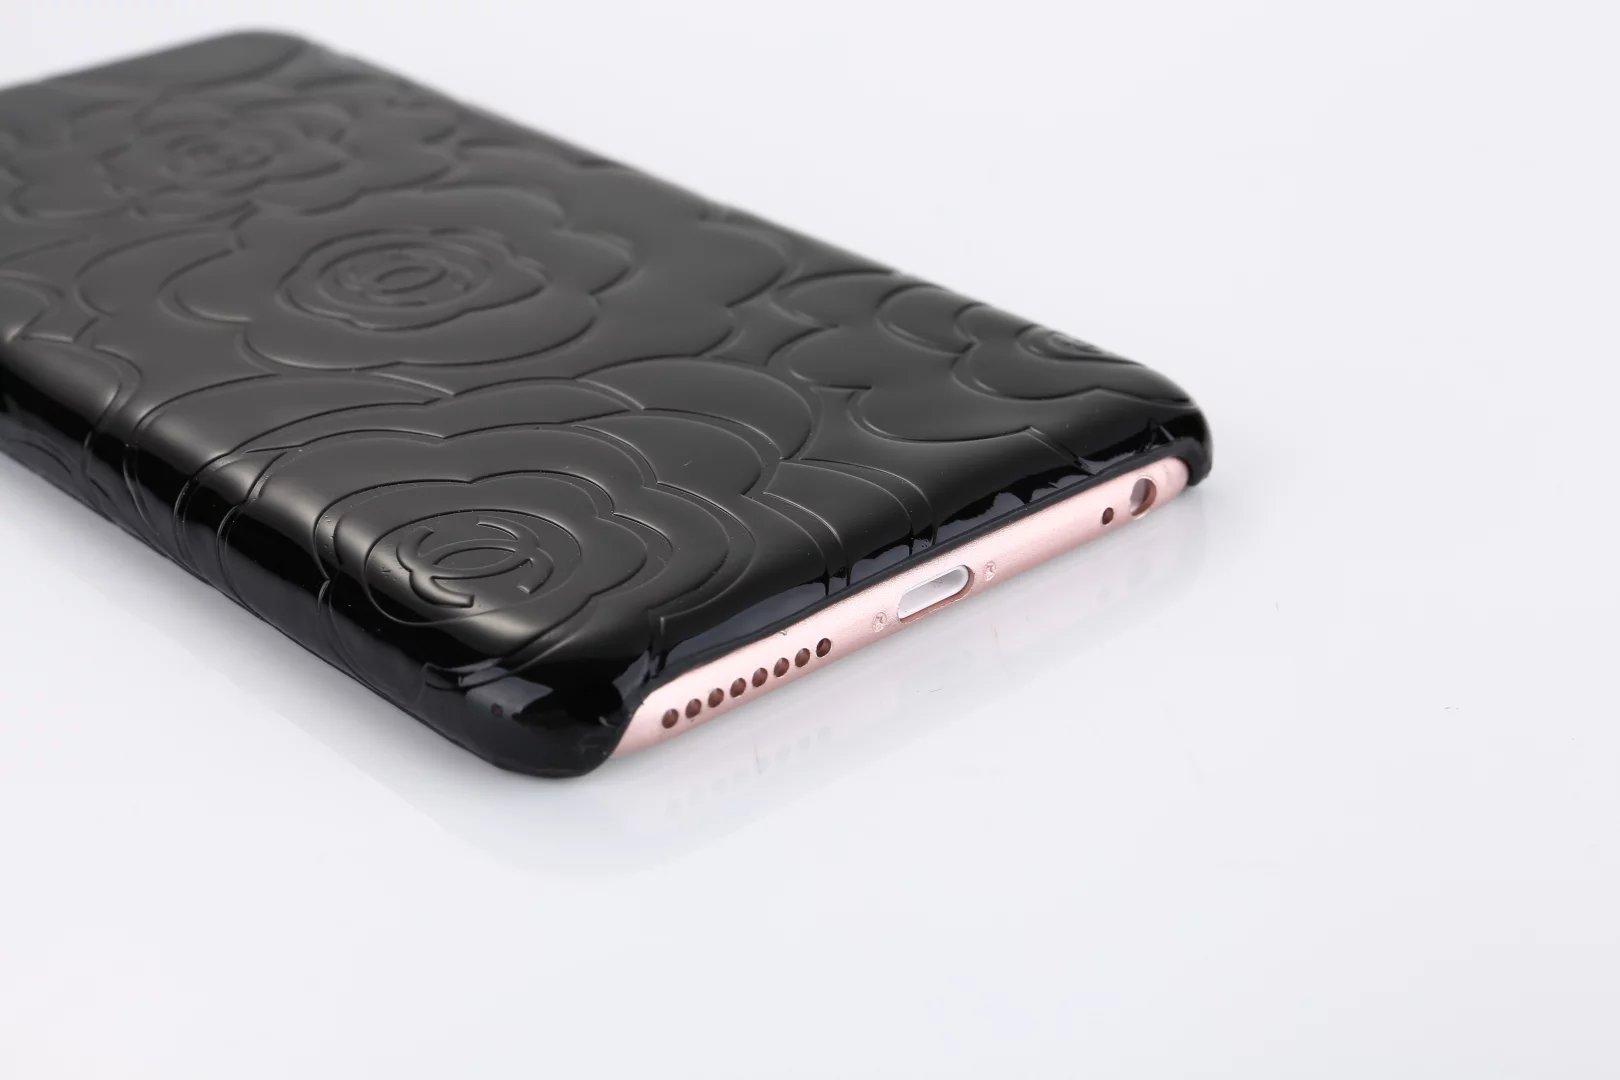 iphone hülle mit foto bedrucken iphone case selber machen Chanel iphone7 Plus hülle iphone 7 Plus oftca7 iphone 7 Plus zubehör handykappen 7lbst gestalten ca7 iphone 7 Plus apple foto cover handy handytasche i phone 7